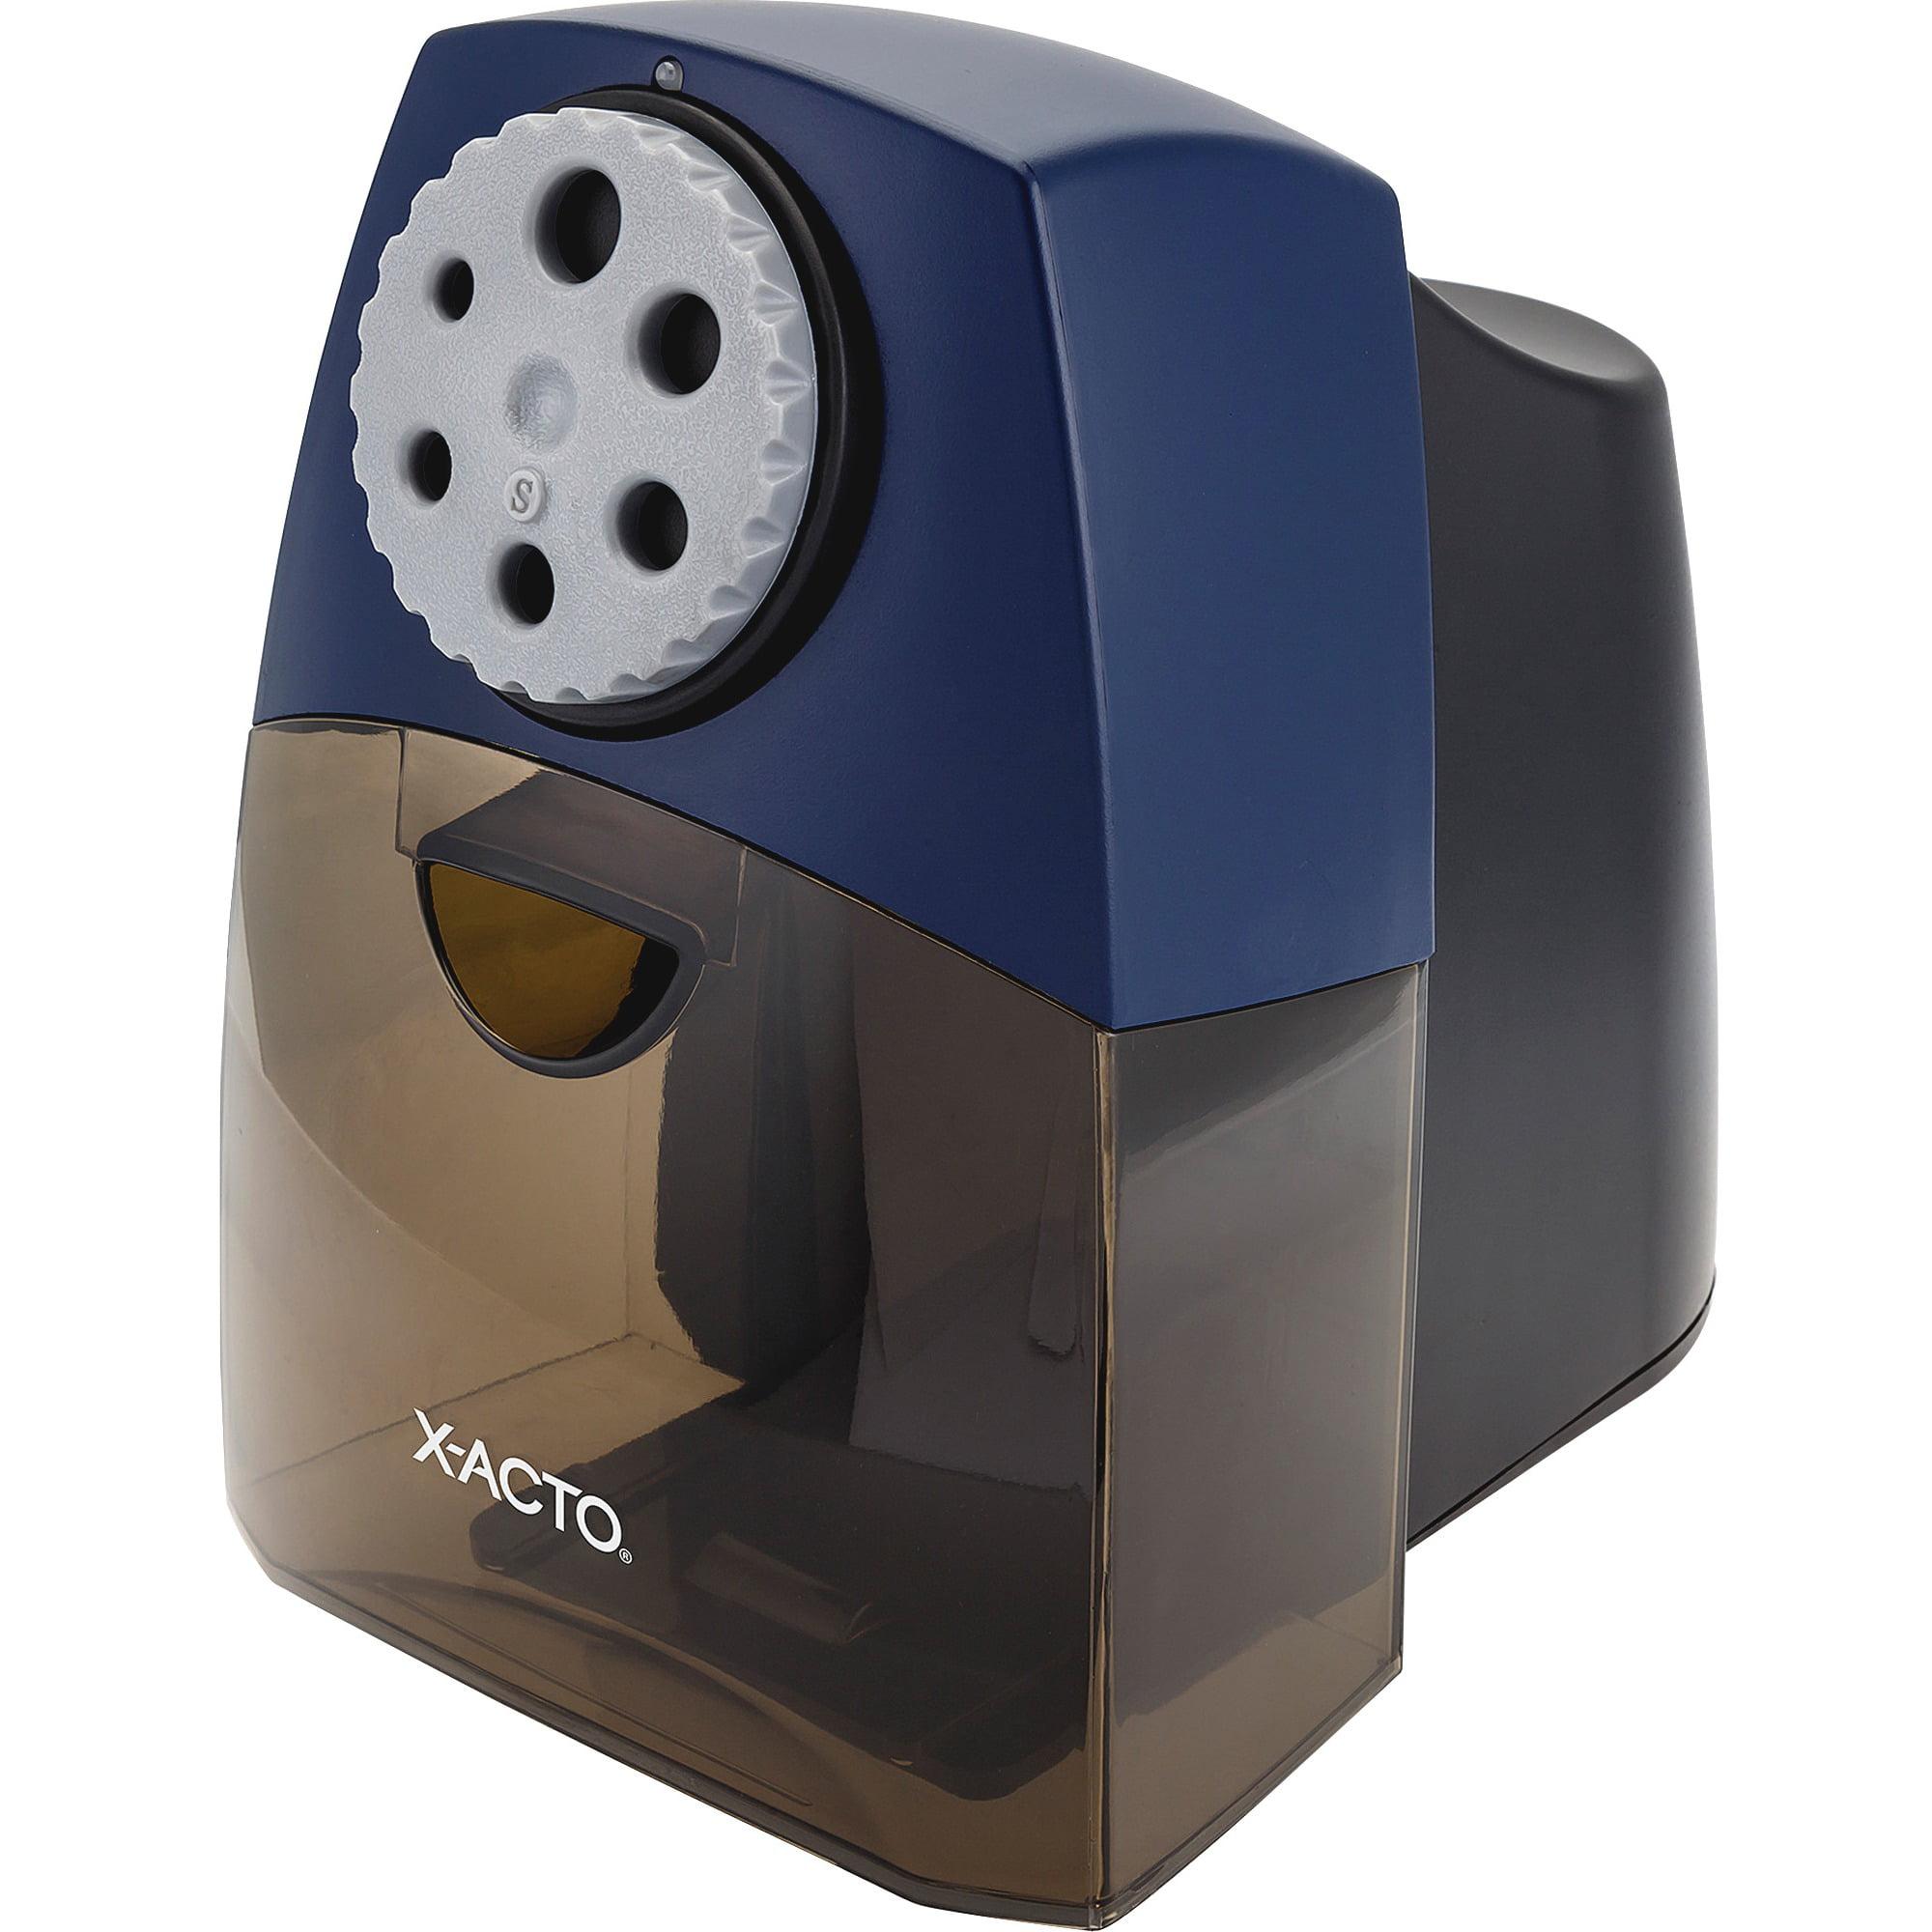 X-Acto Prox Classroom Electric Pencil Sharpener